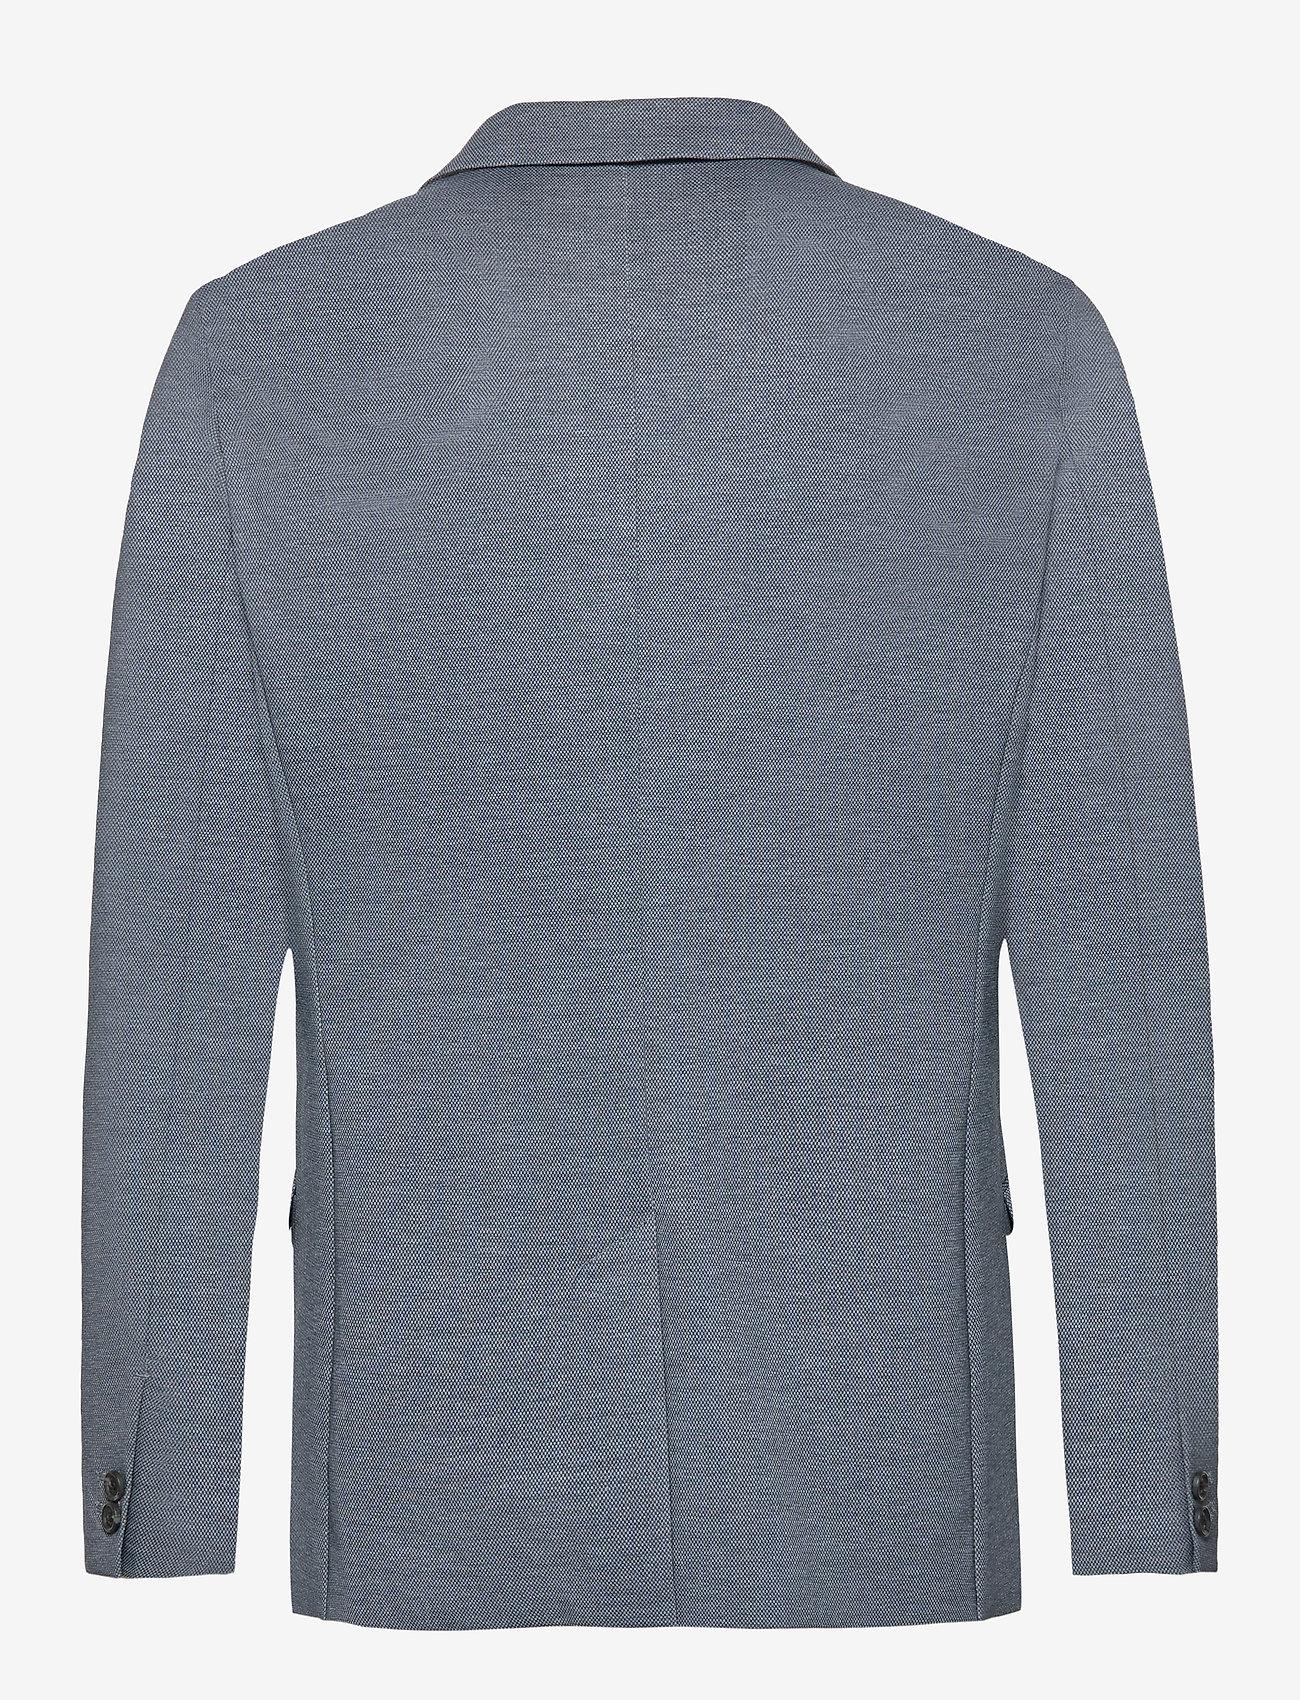 Lindbergh - Knitted blazer - yksiriviset bleiserit - grey mix - 1